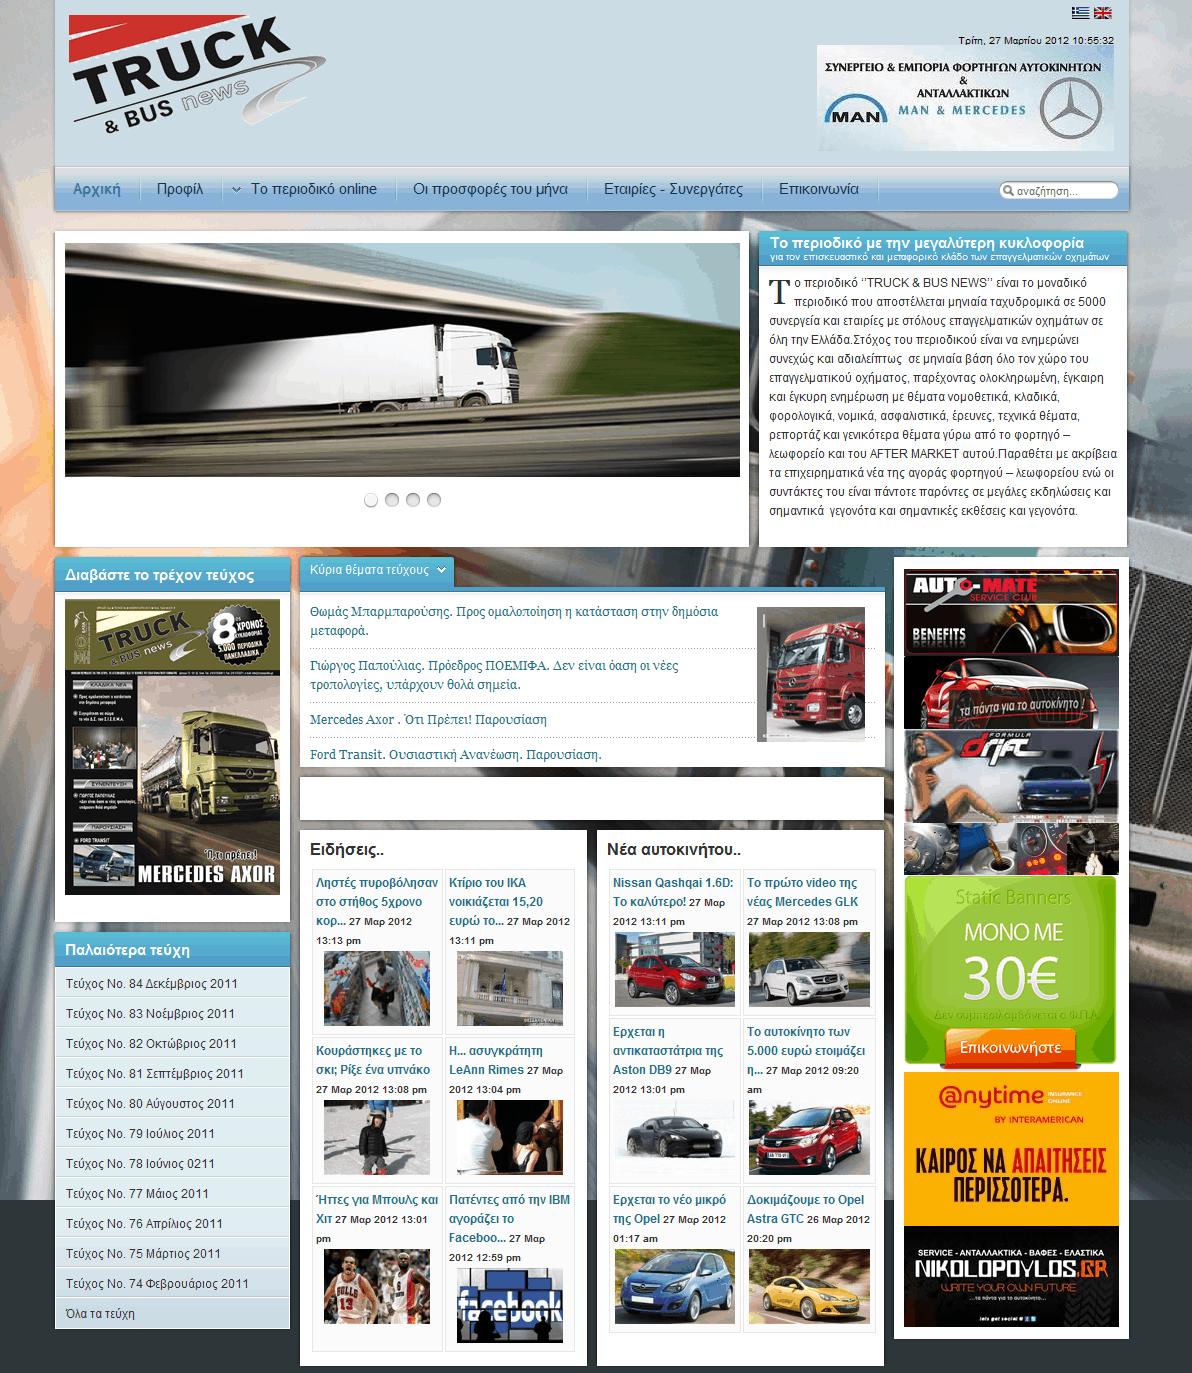 truckbusnews.gr